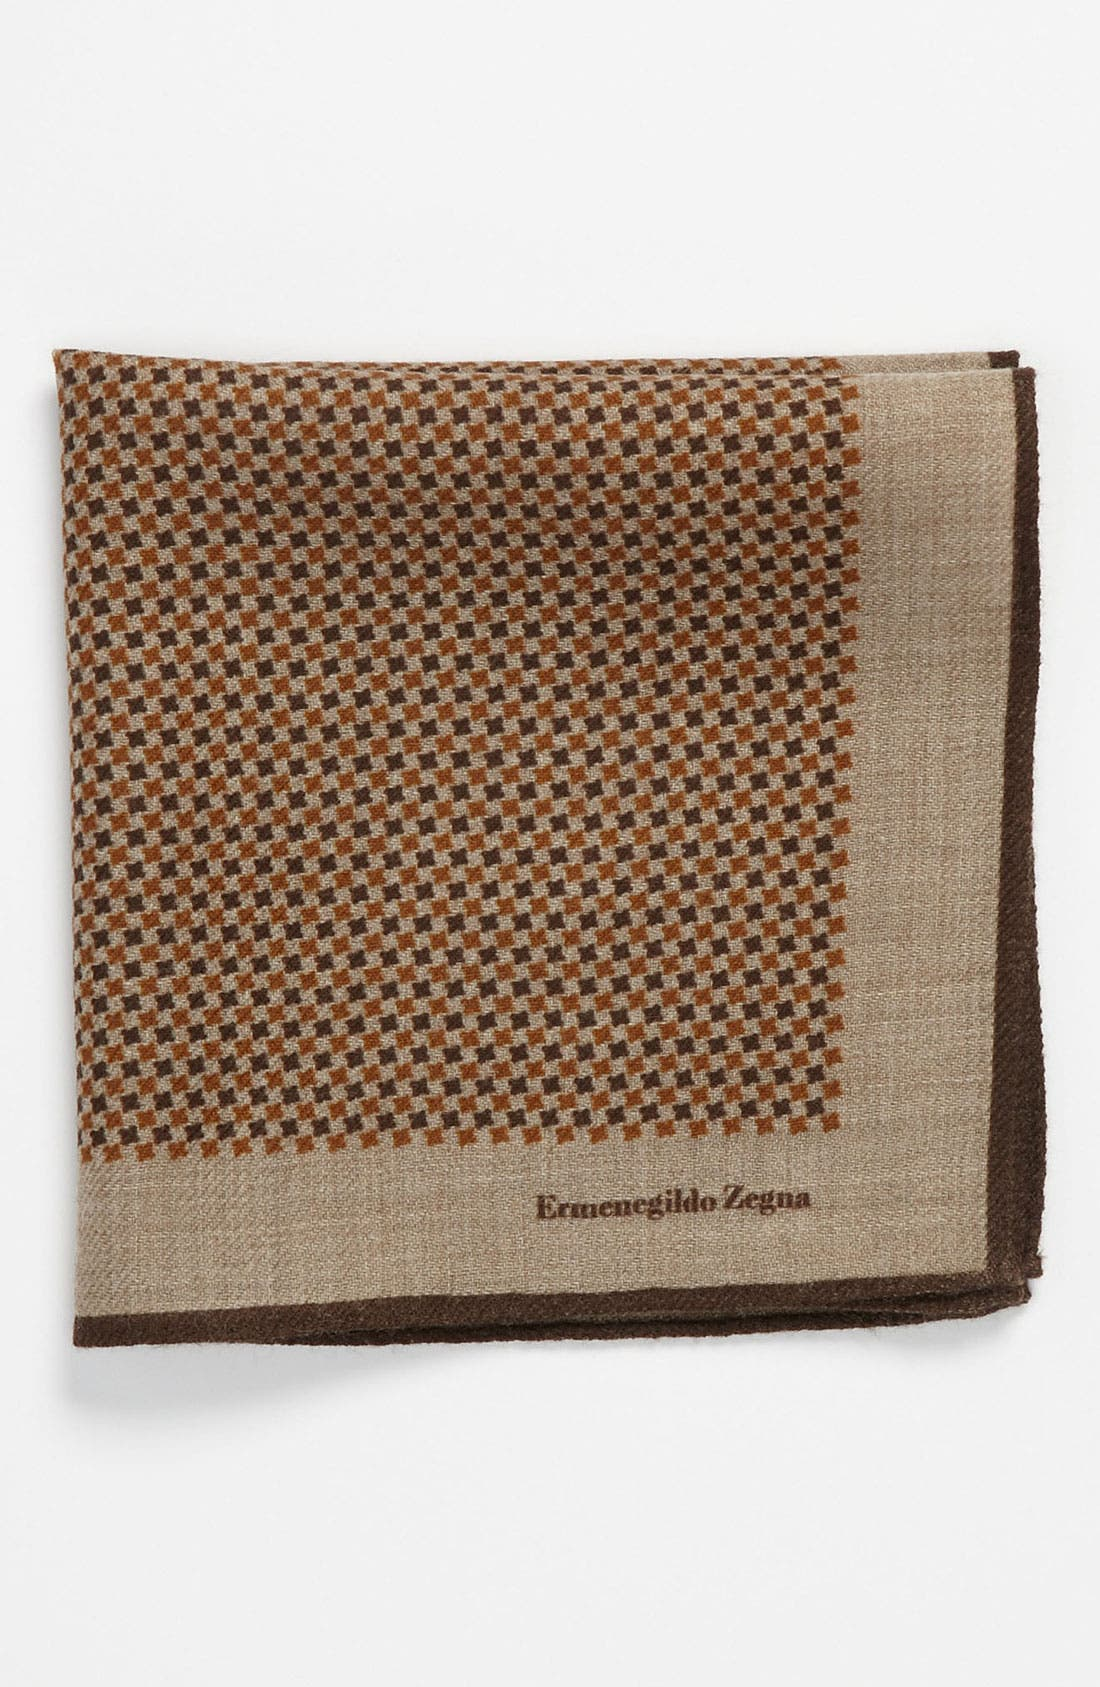 Alternate Image 1 Selected - Ermenegildo Zegna Wool Pocket Square